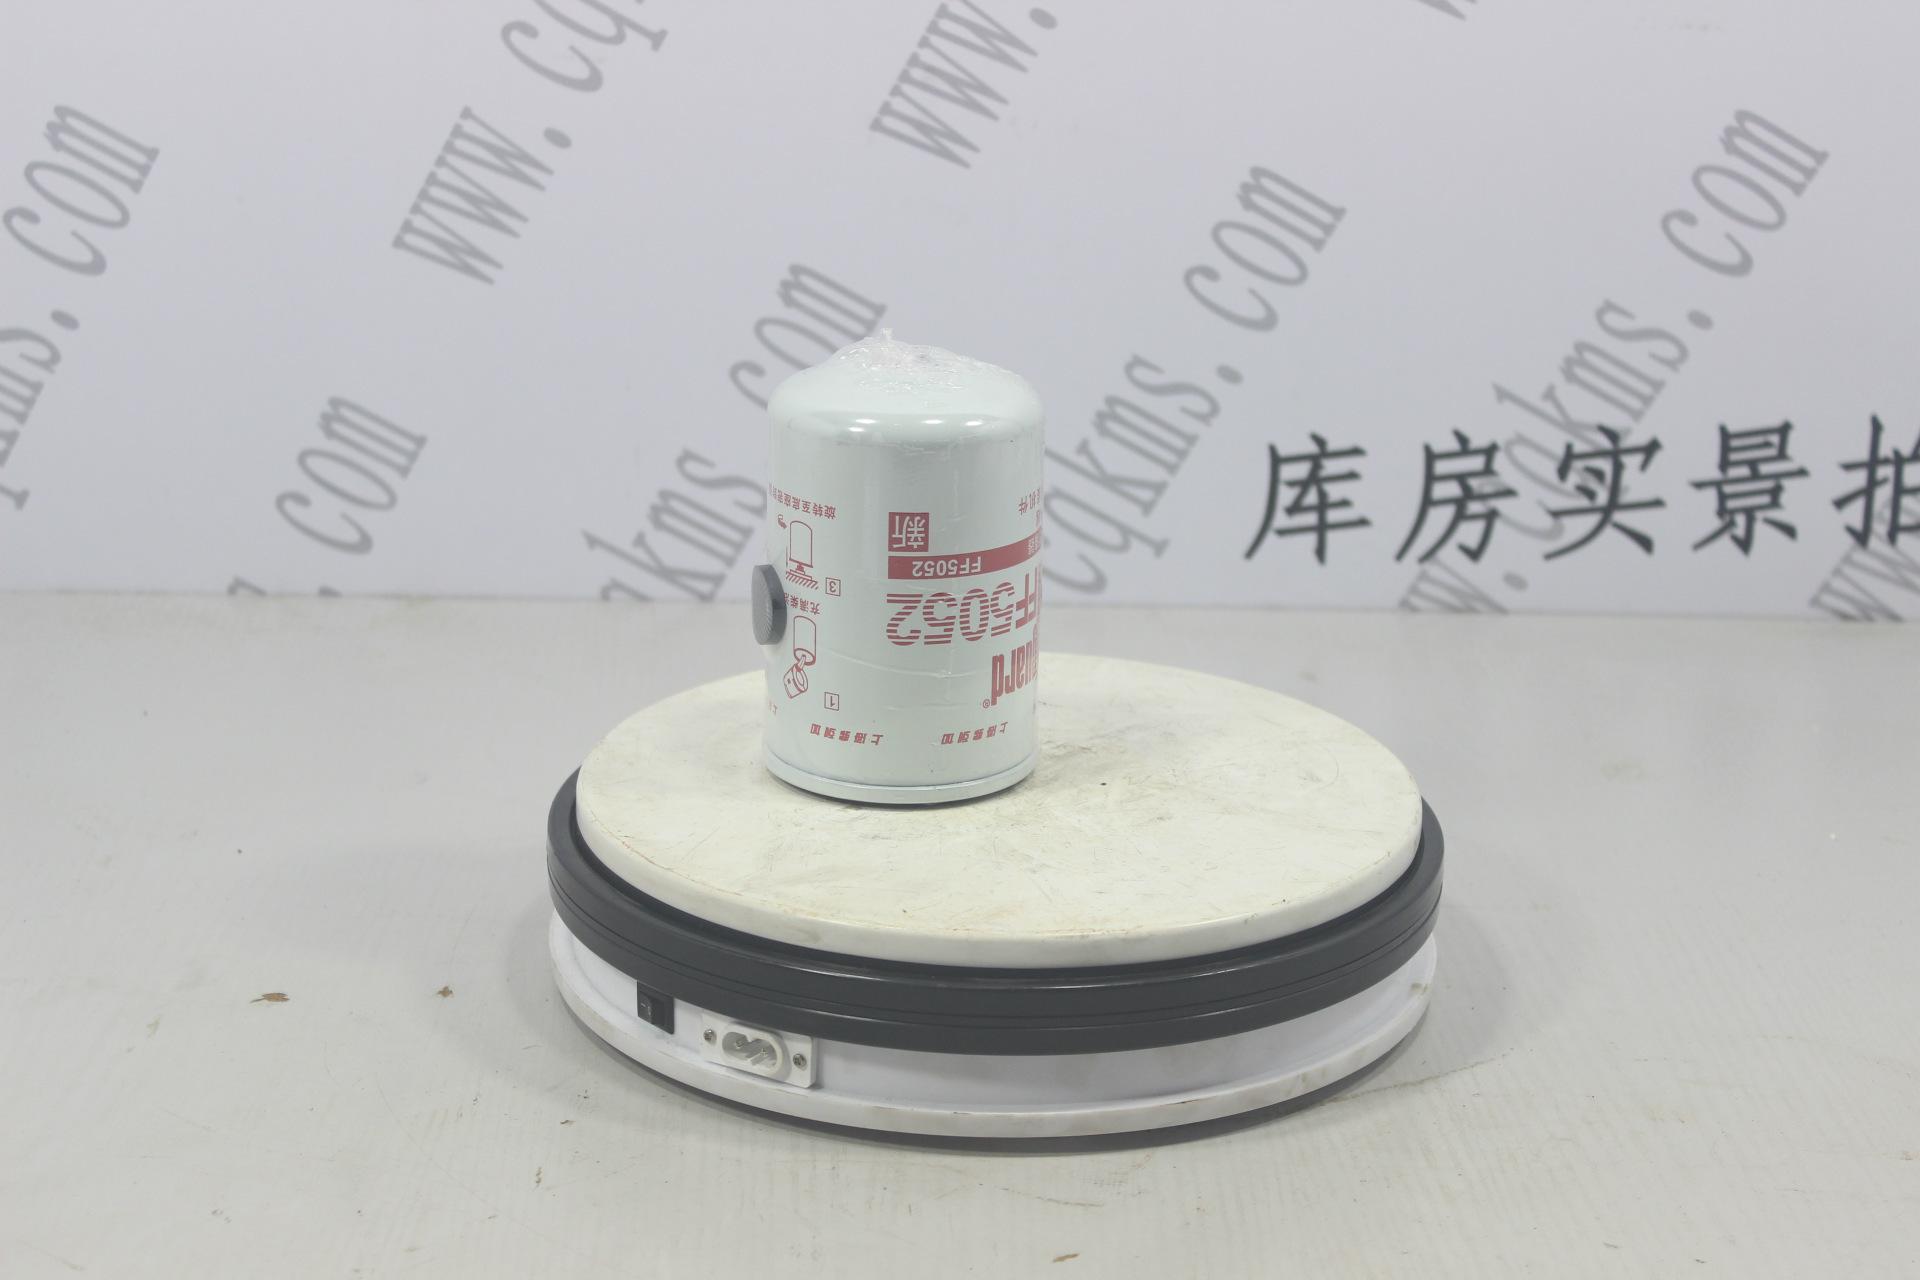 kms01725-FF5052-滤清器-用于4BT康明斯发动机-4BT-参考规格高10.6cm,外径7.6cm-参考重量400-400图片1